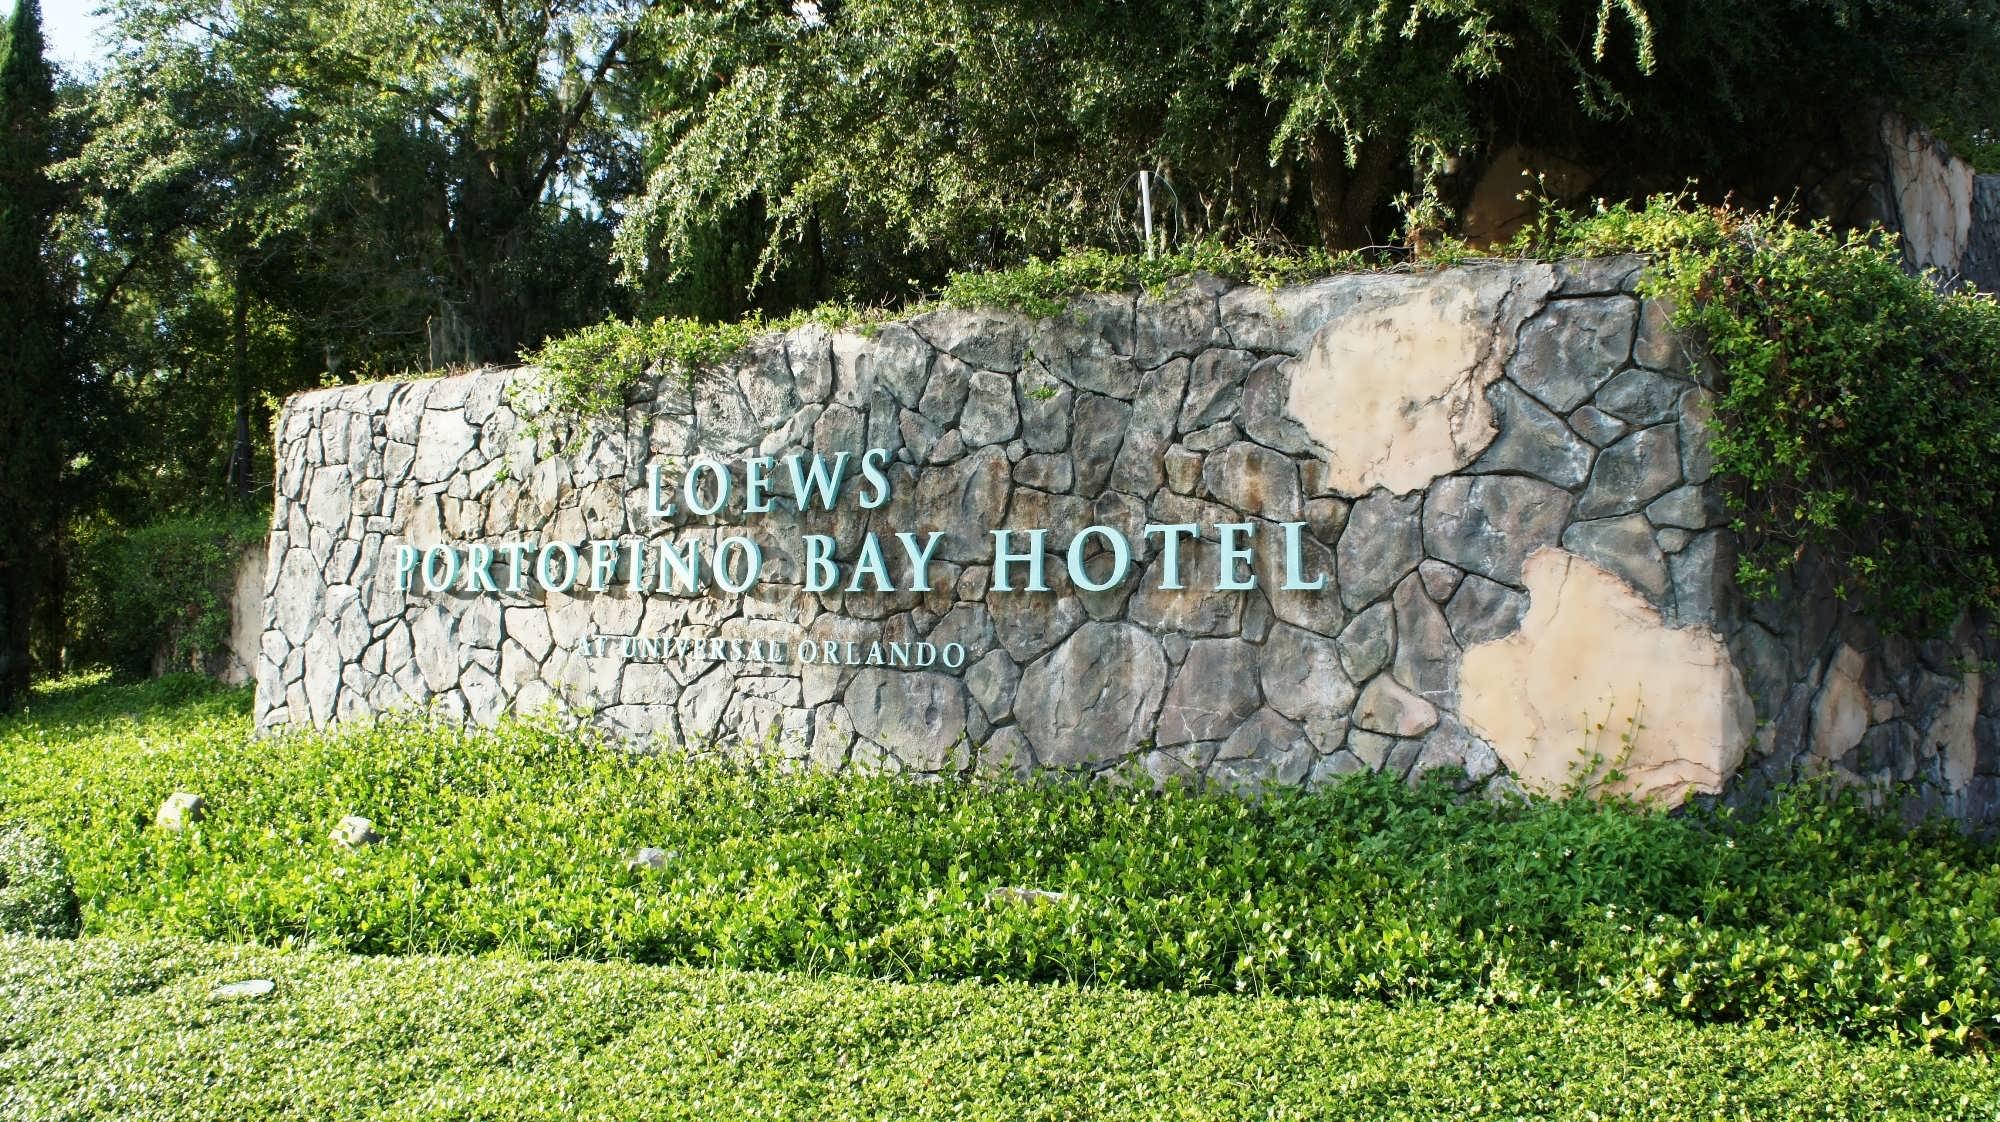 Loews Portofino Bay Hotel entrance sign